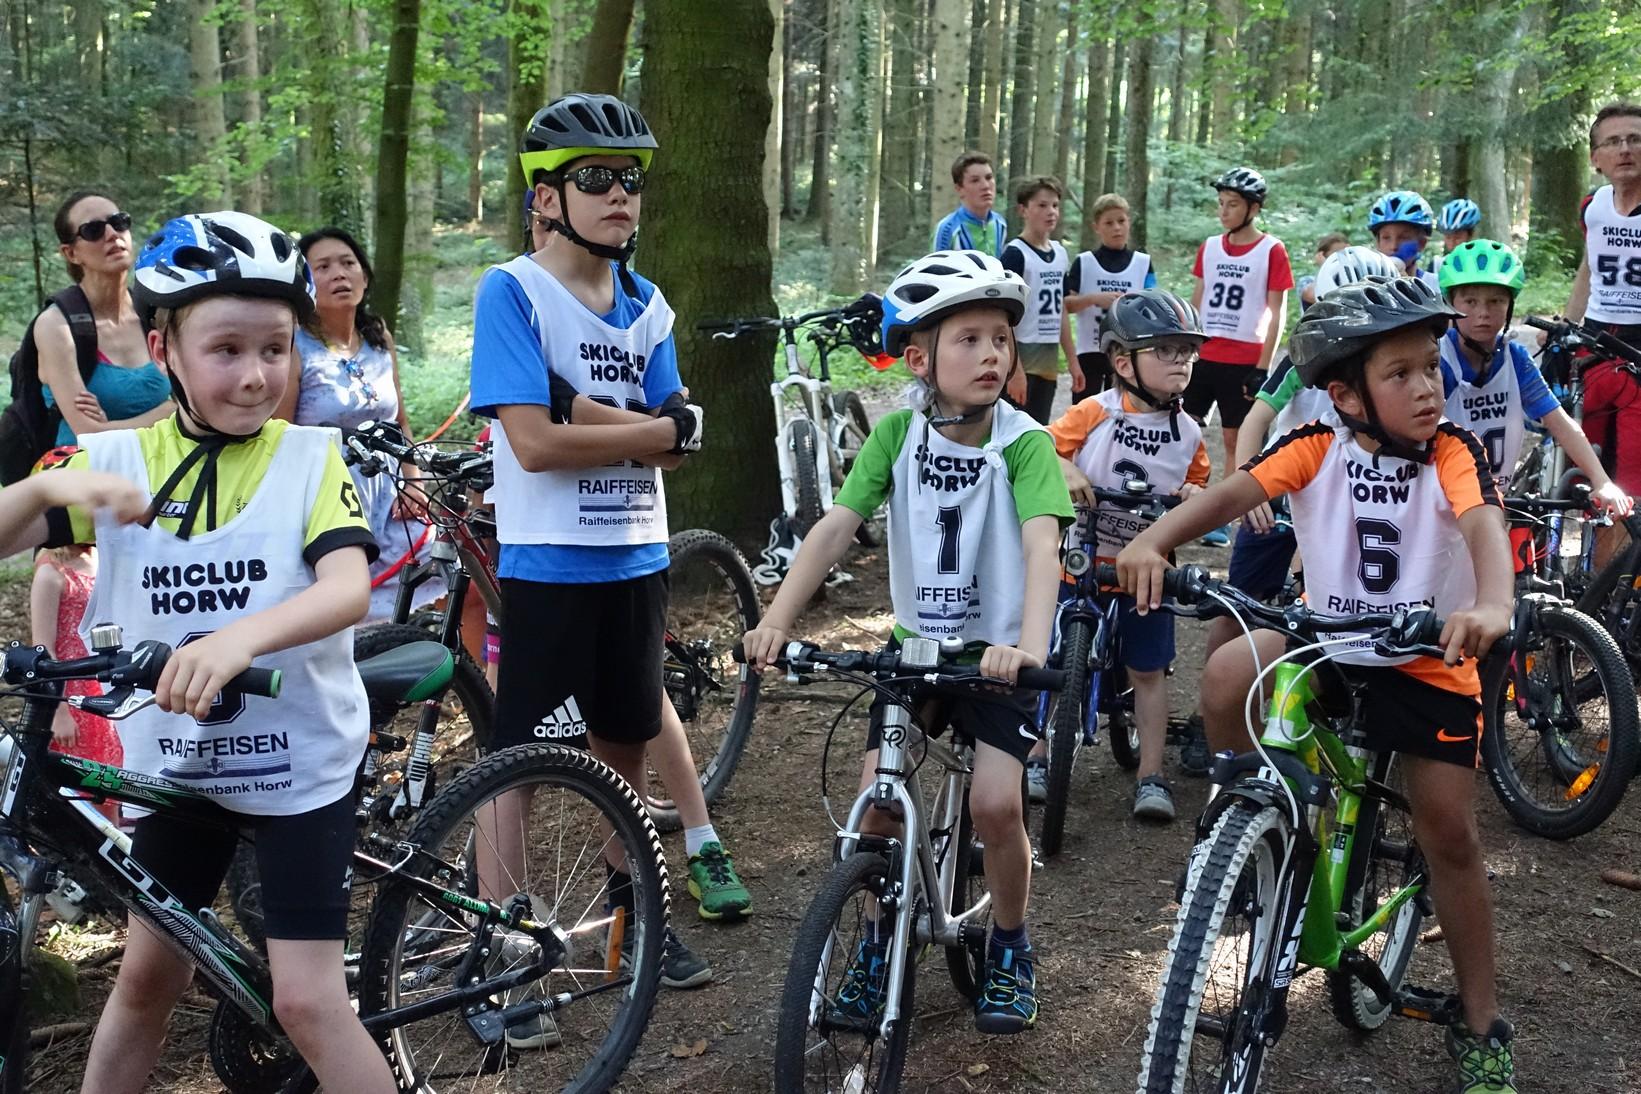 2019.06.26 - Bikerennen (CUP)